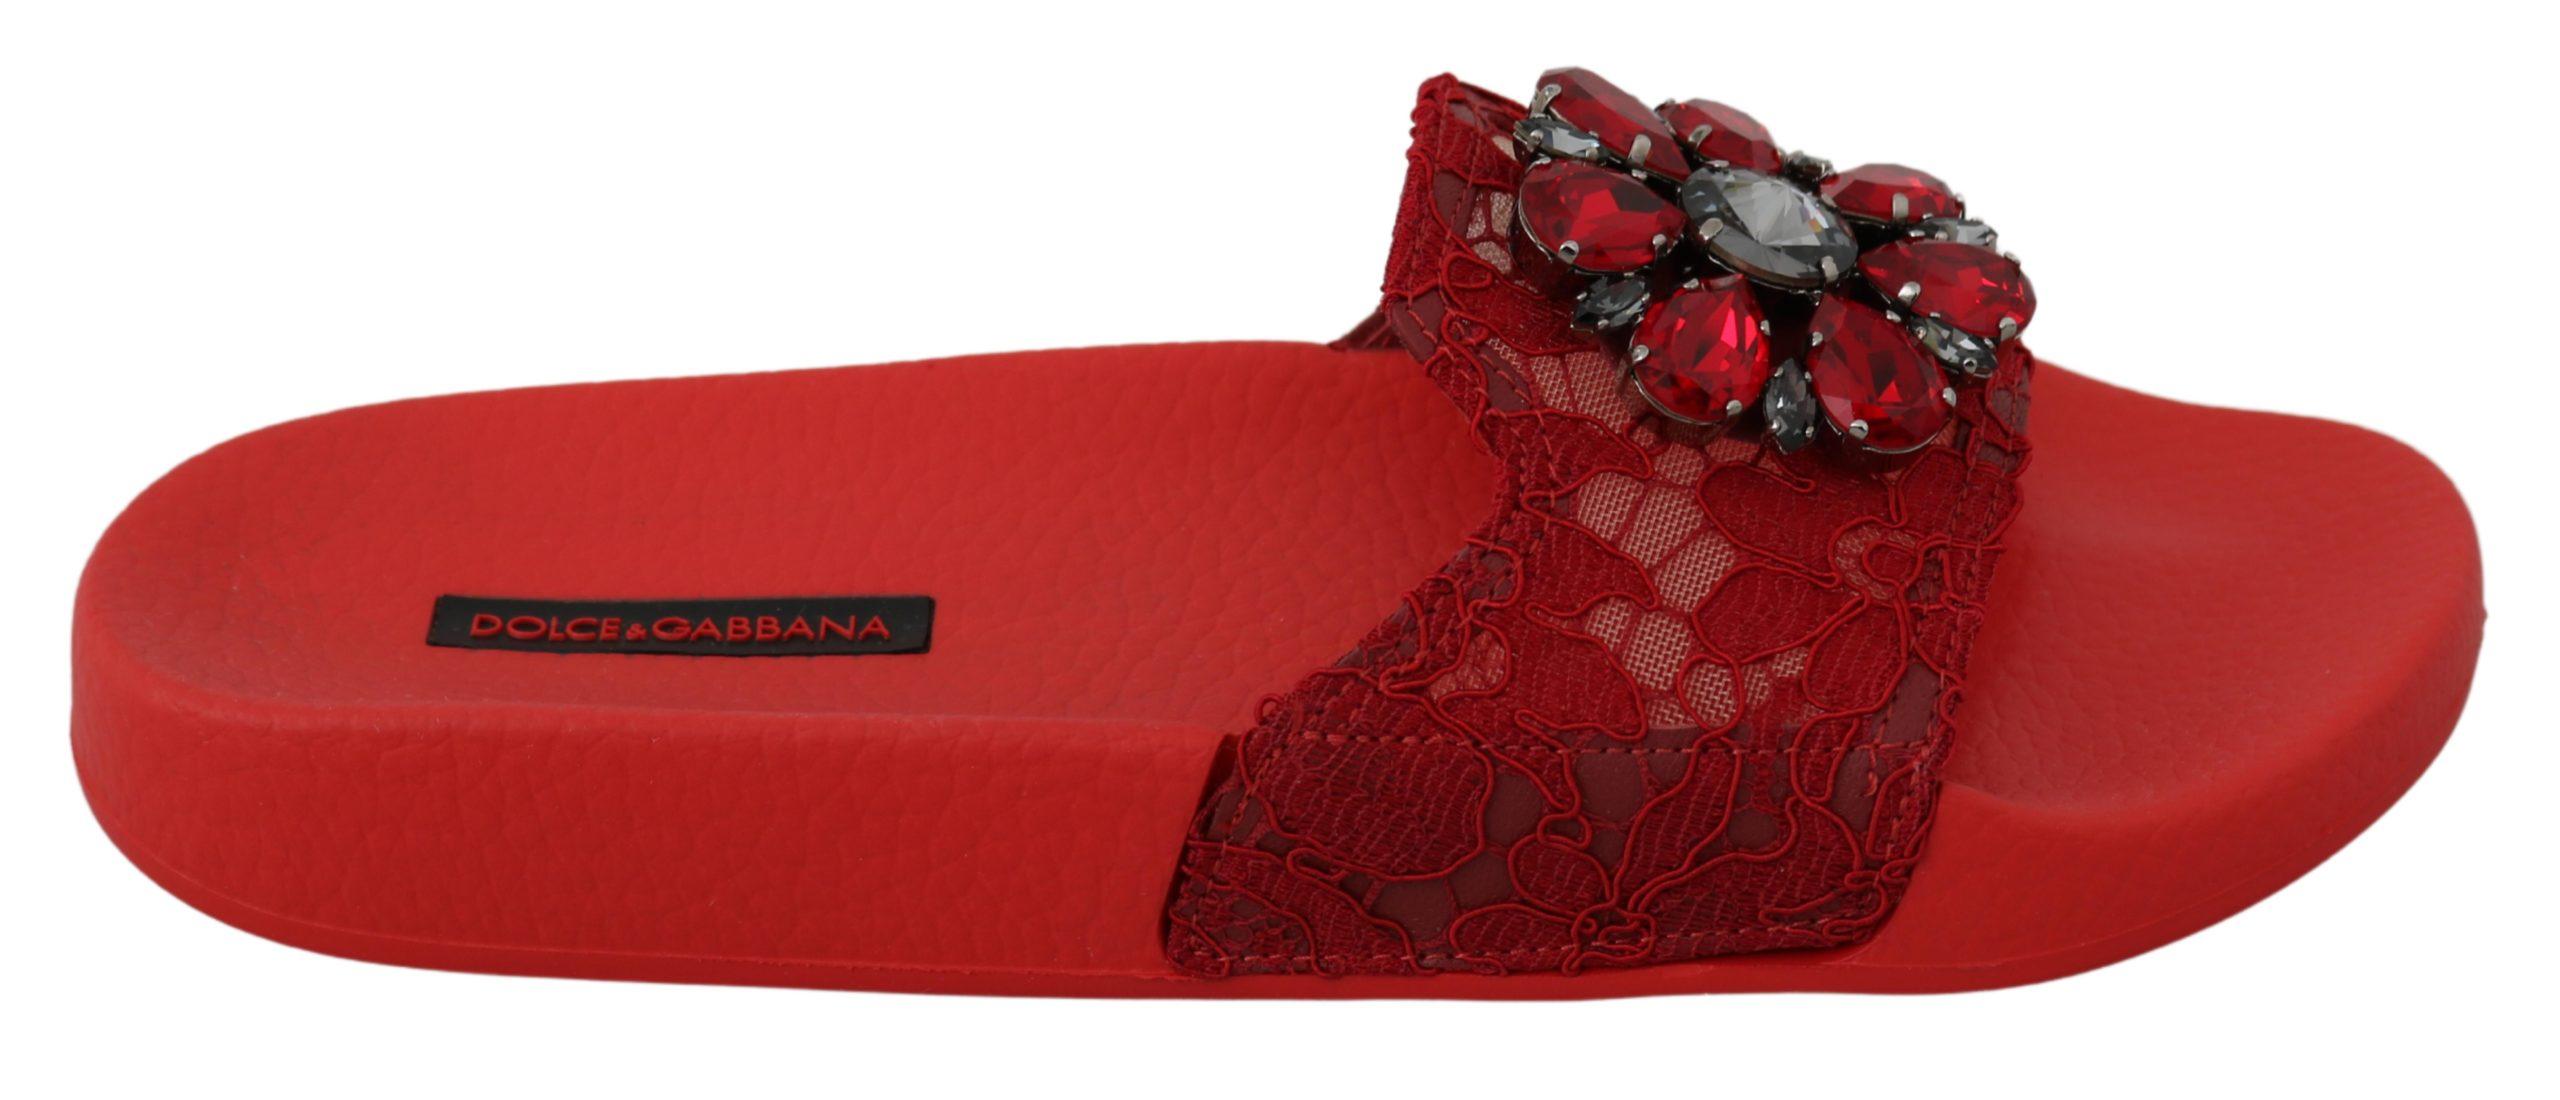 Dolce & Gabbana Women's Lace Crystal Slides Sandals Red LA6555 - EU35/US4.5